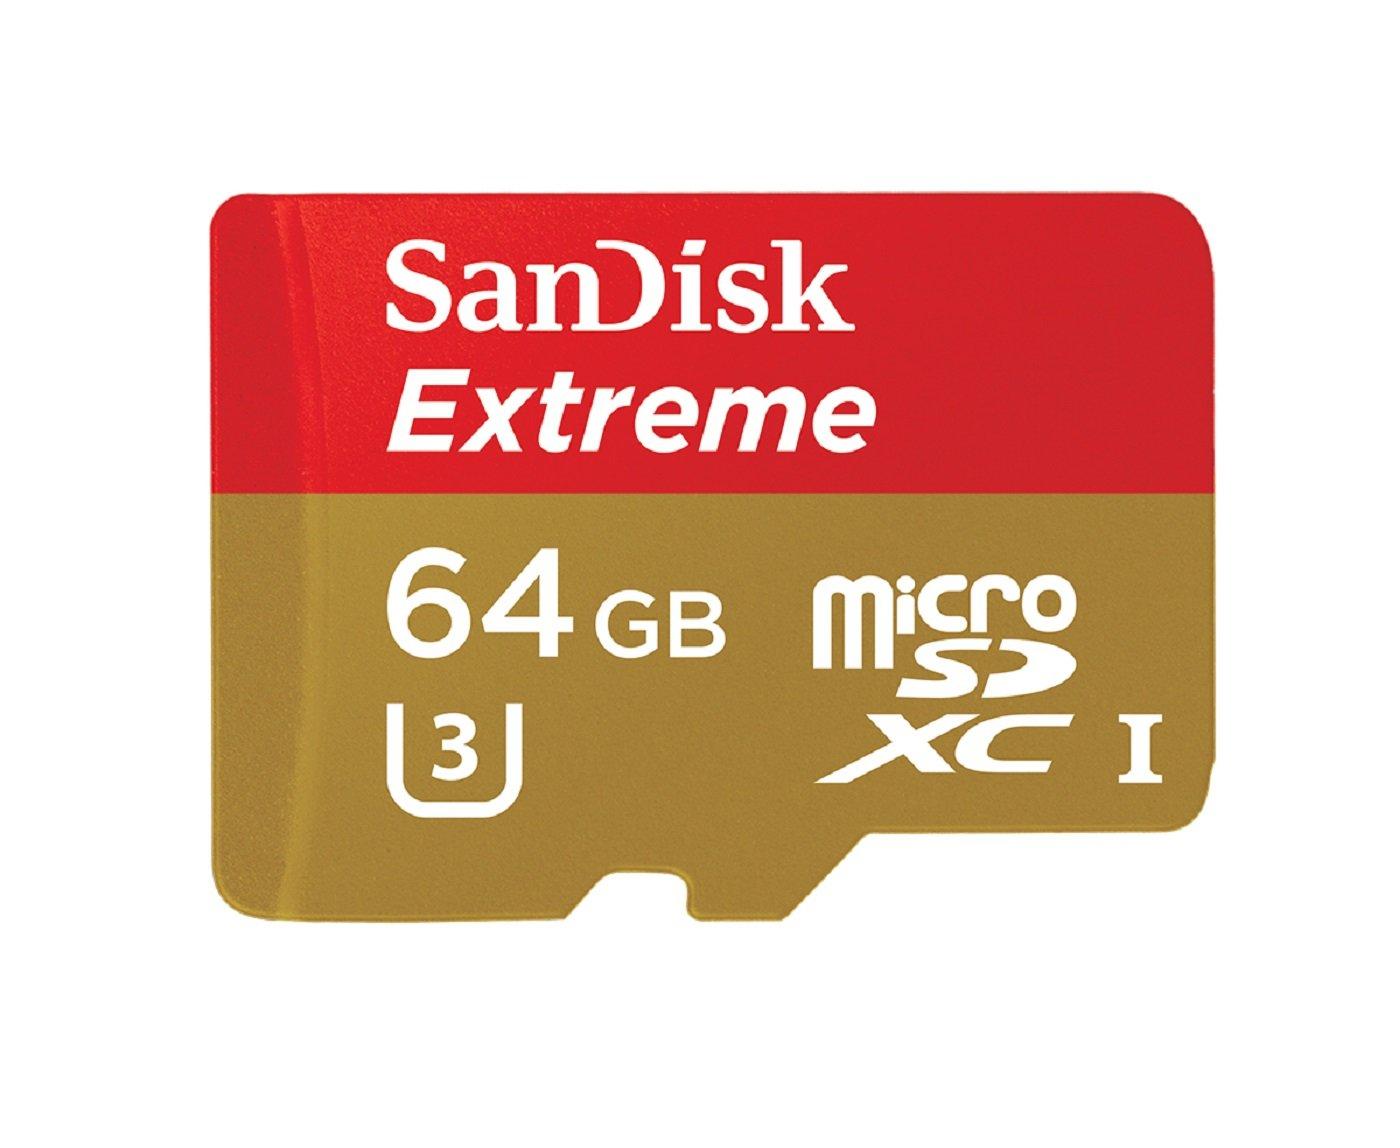 Tarjeta de memoria microSDXC de 64 GB SanDisk SDSQXNE-064G-GN6AA por solo 30,99€